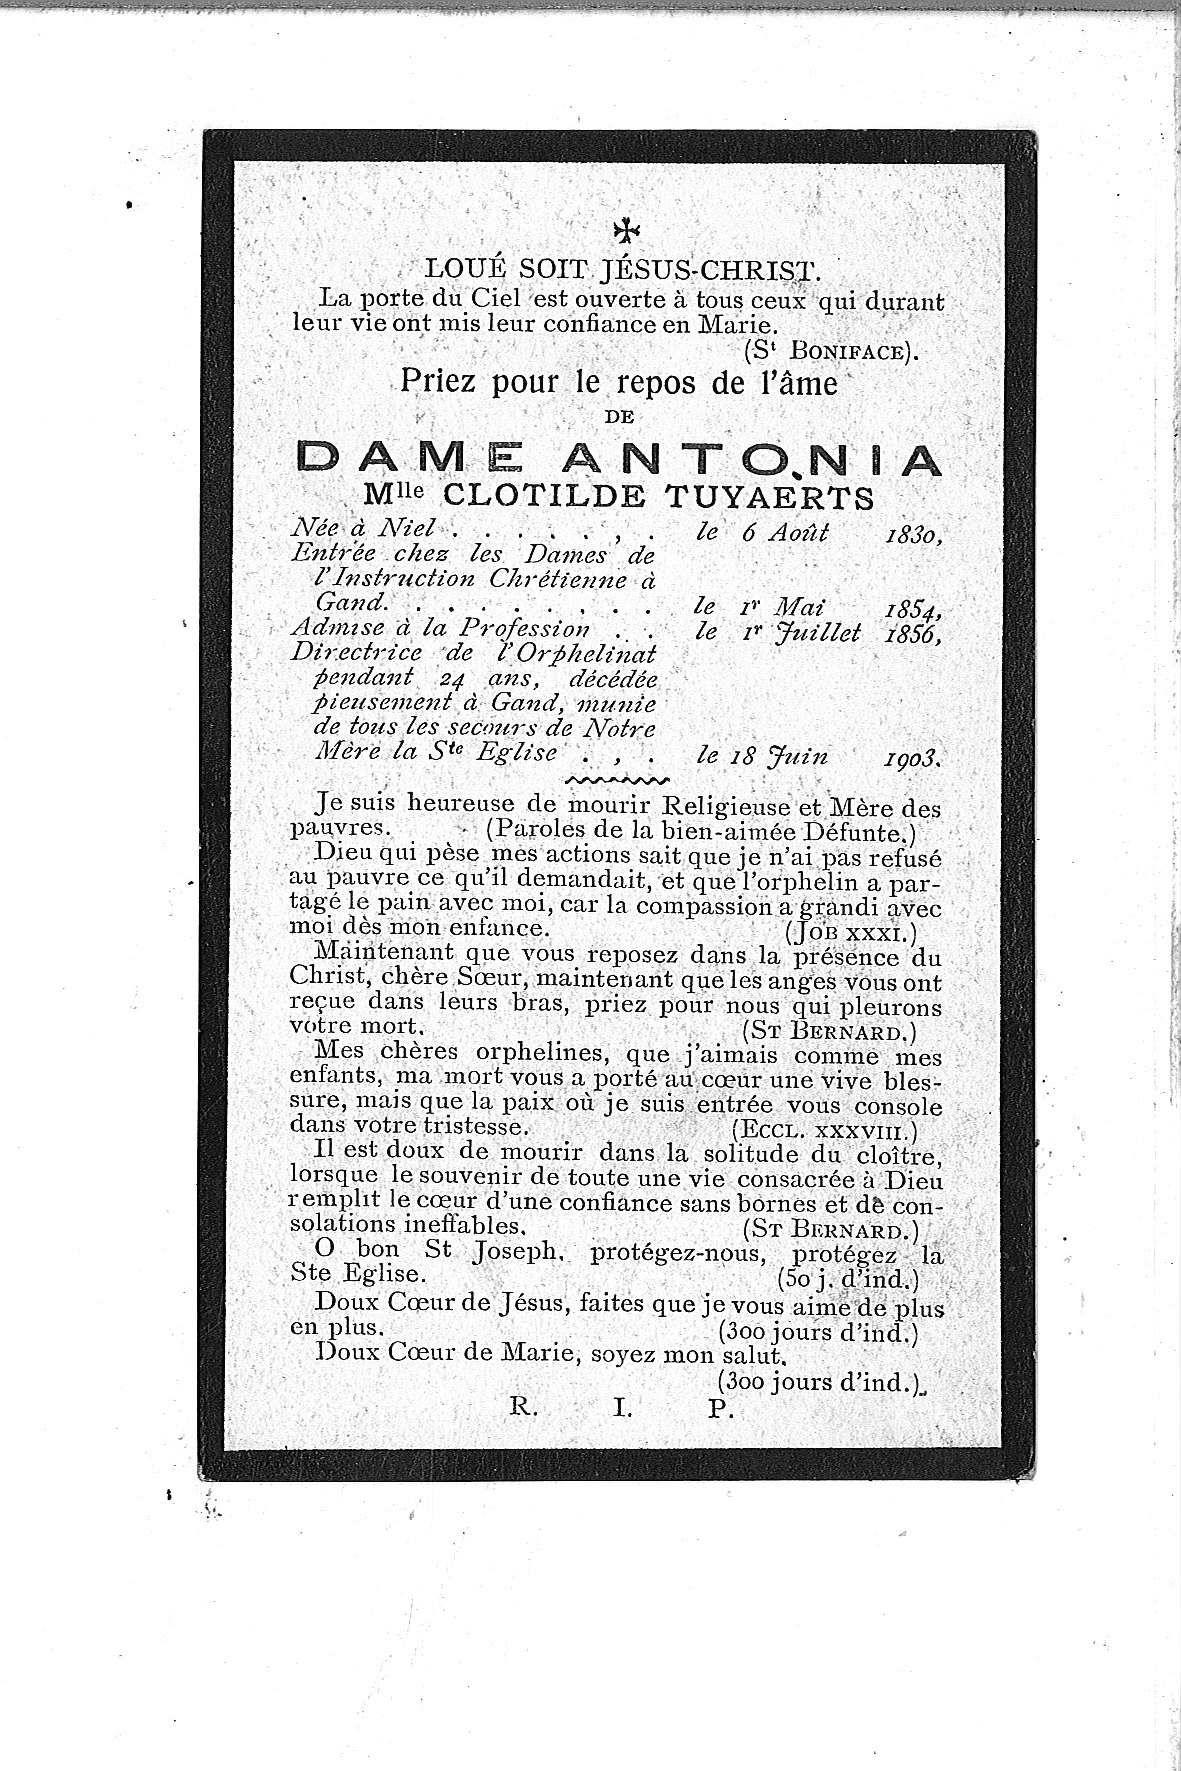 Clotilde-(1903)-20121017085721_00006.jpg